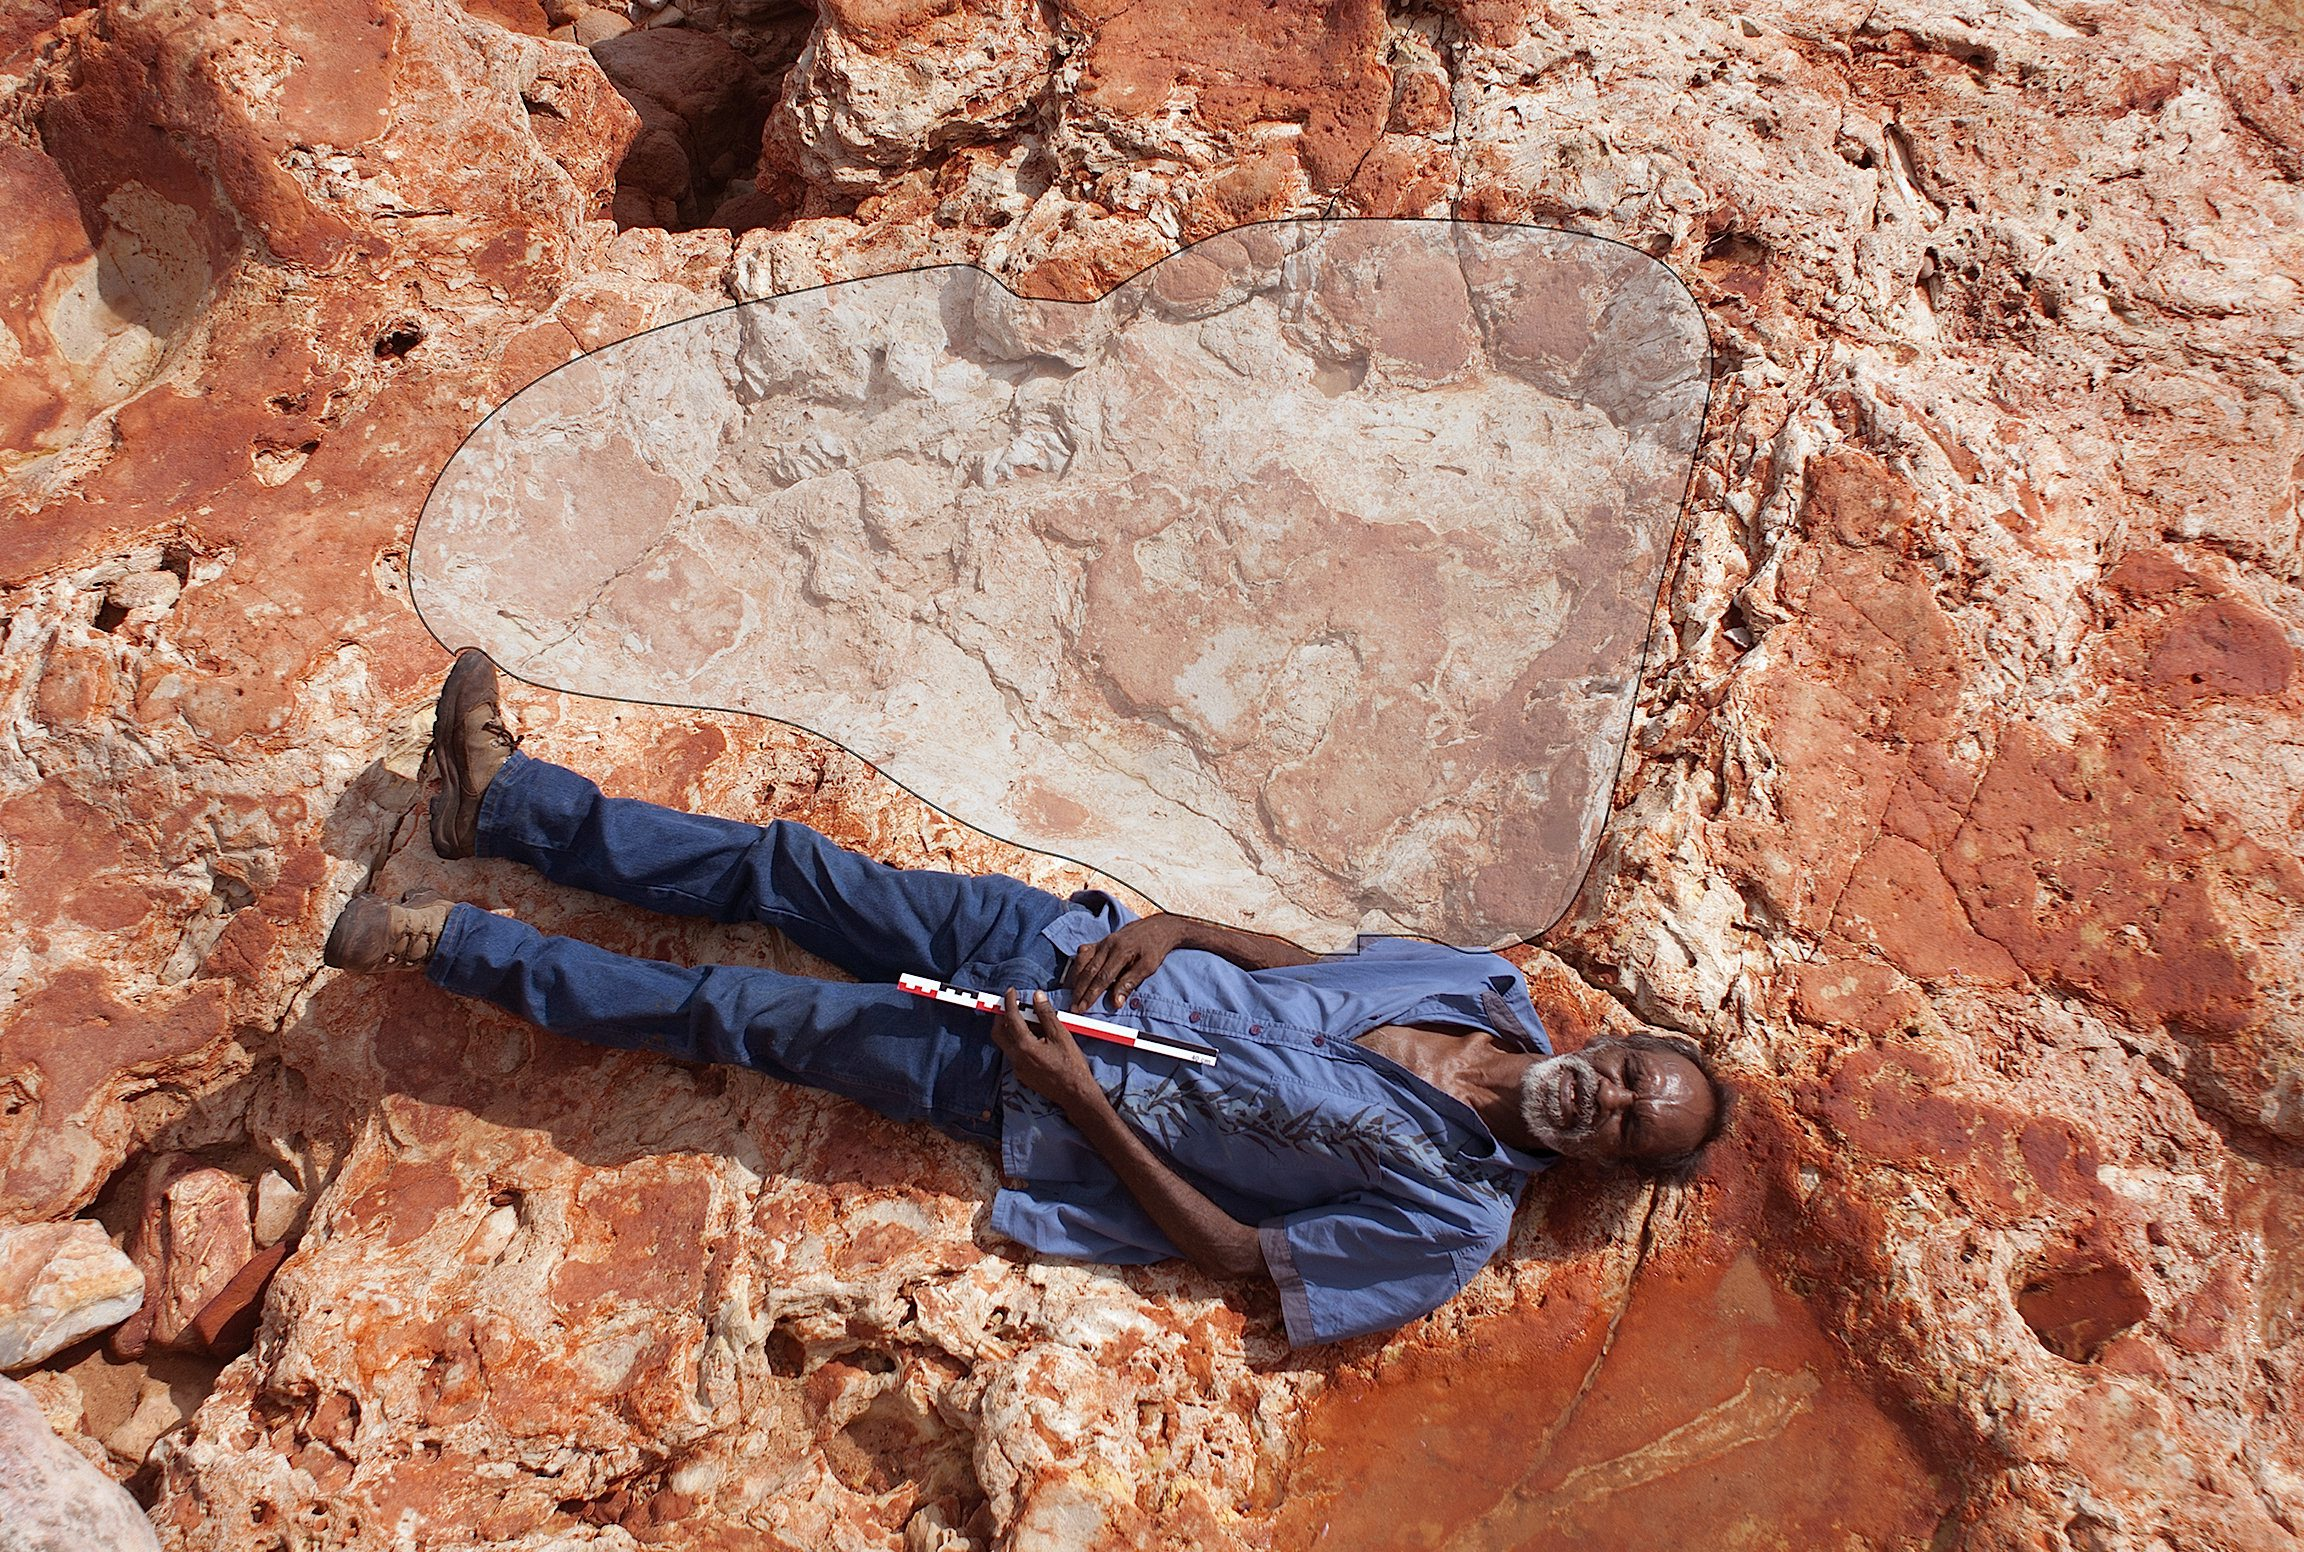 Aboridžinski starješina i šef prava naroda Goolarabooloo Richard Hunter leži pored 175cm otiska stopala sauropoda